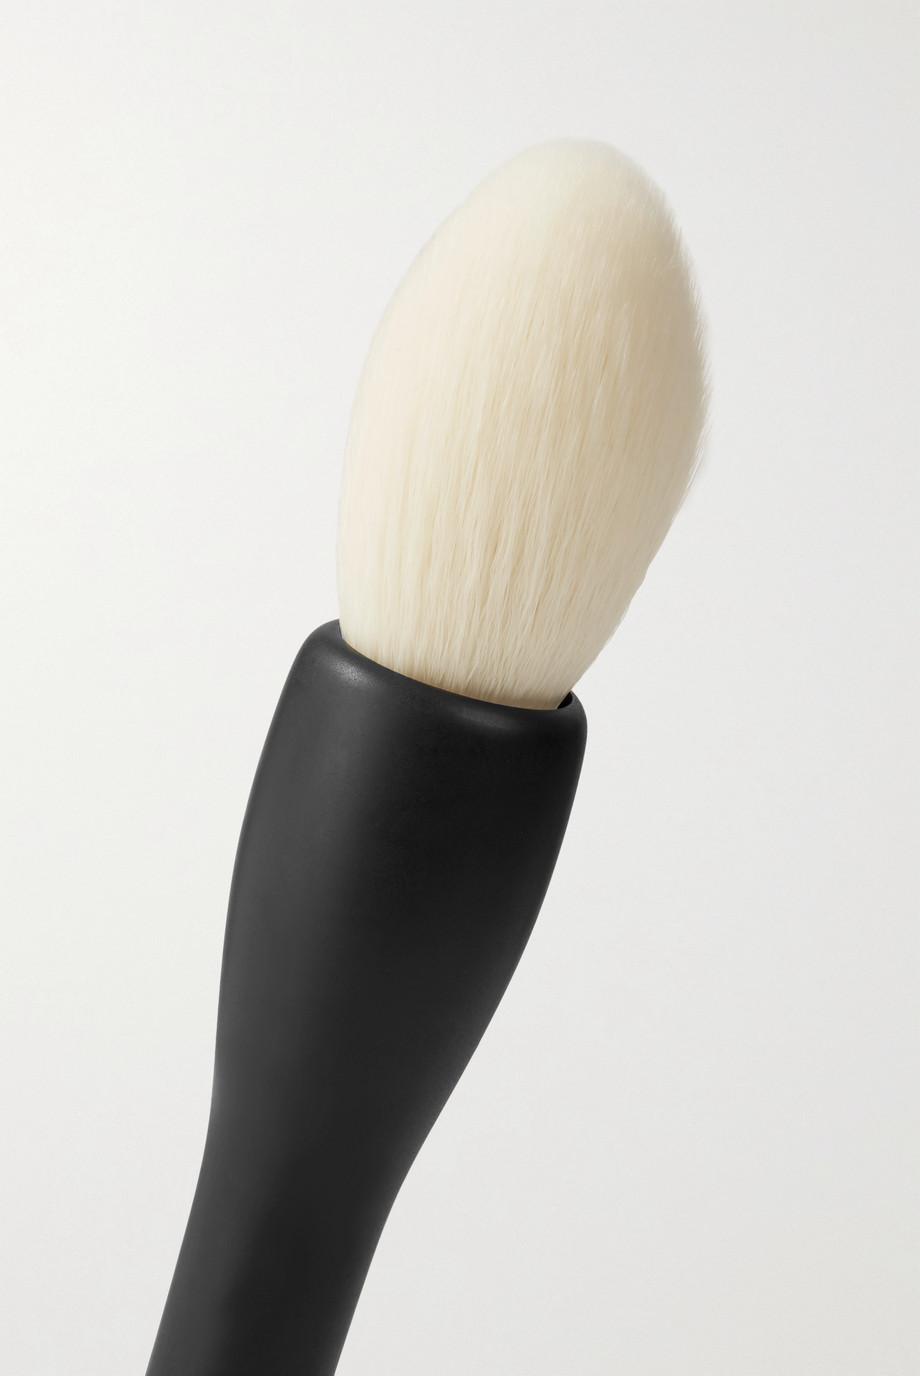 Rae Morris Pinceau Deluxe Kabuki Jishaku 1 Vegan